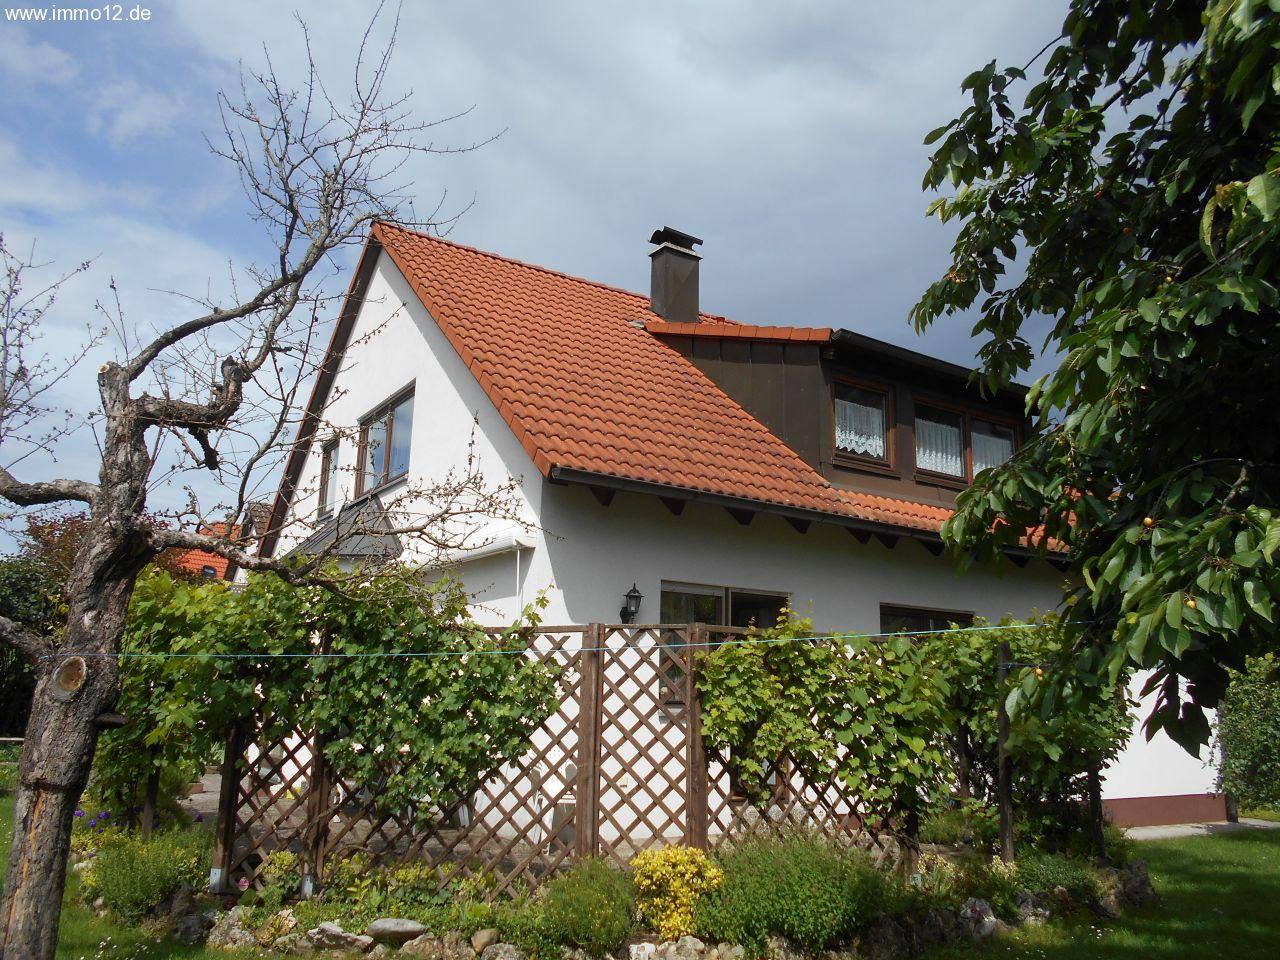 Immobilien n rnberg freistehendes 2 familienhaus und for Immobilien nurnberg privat